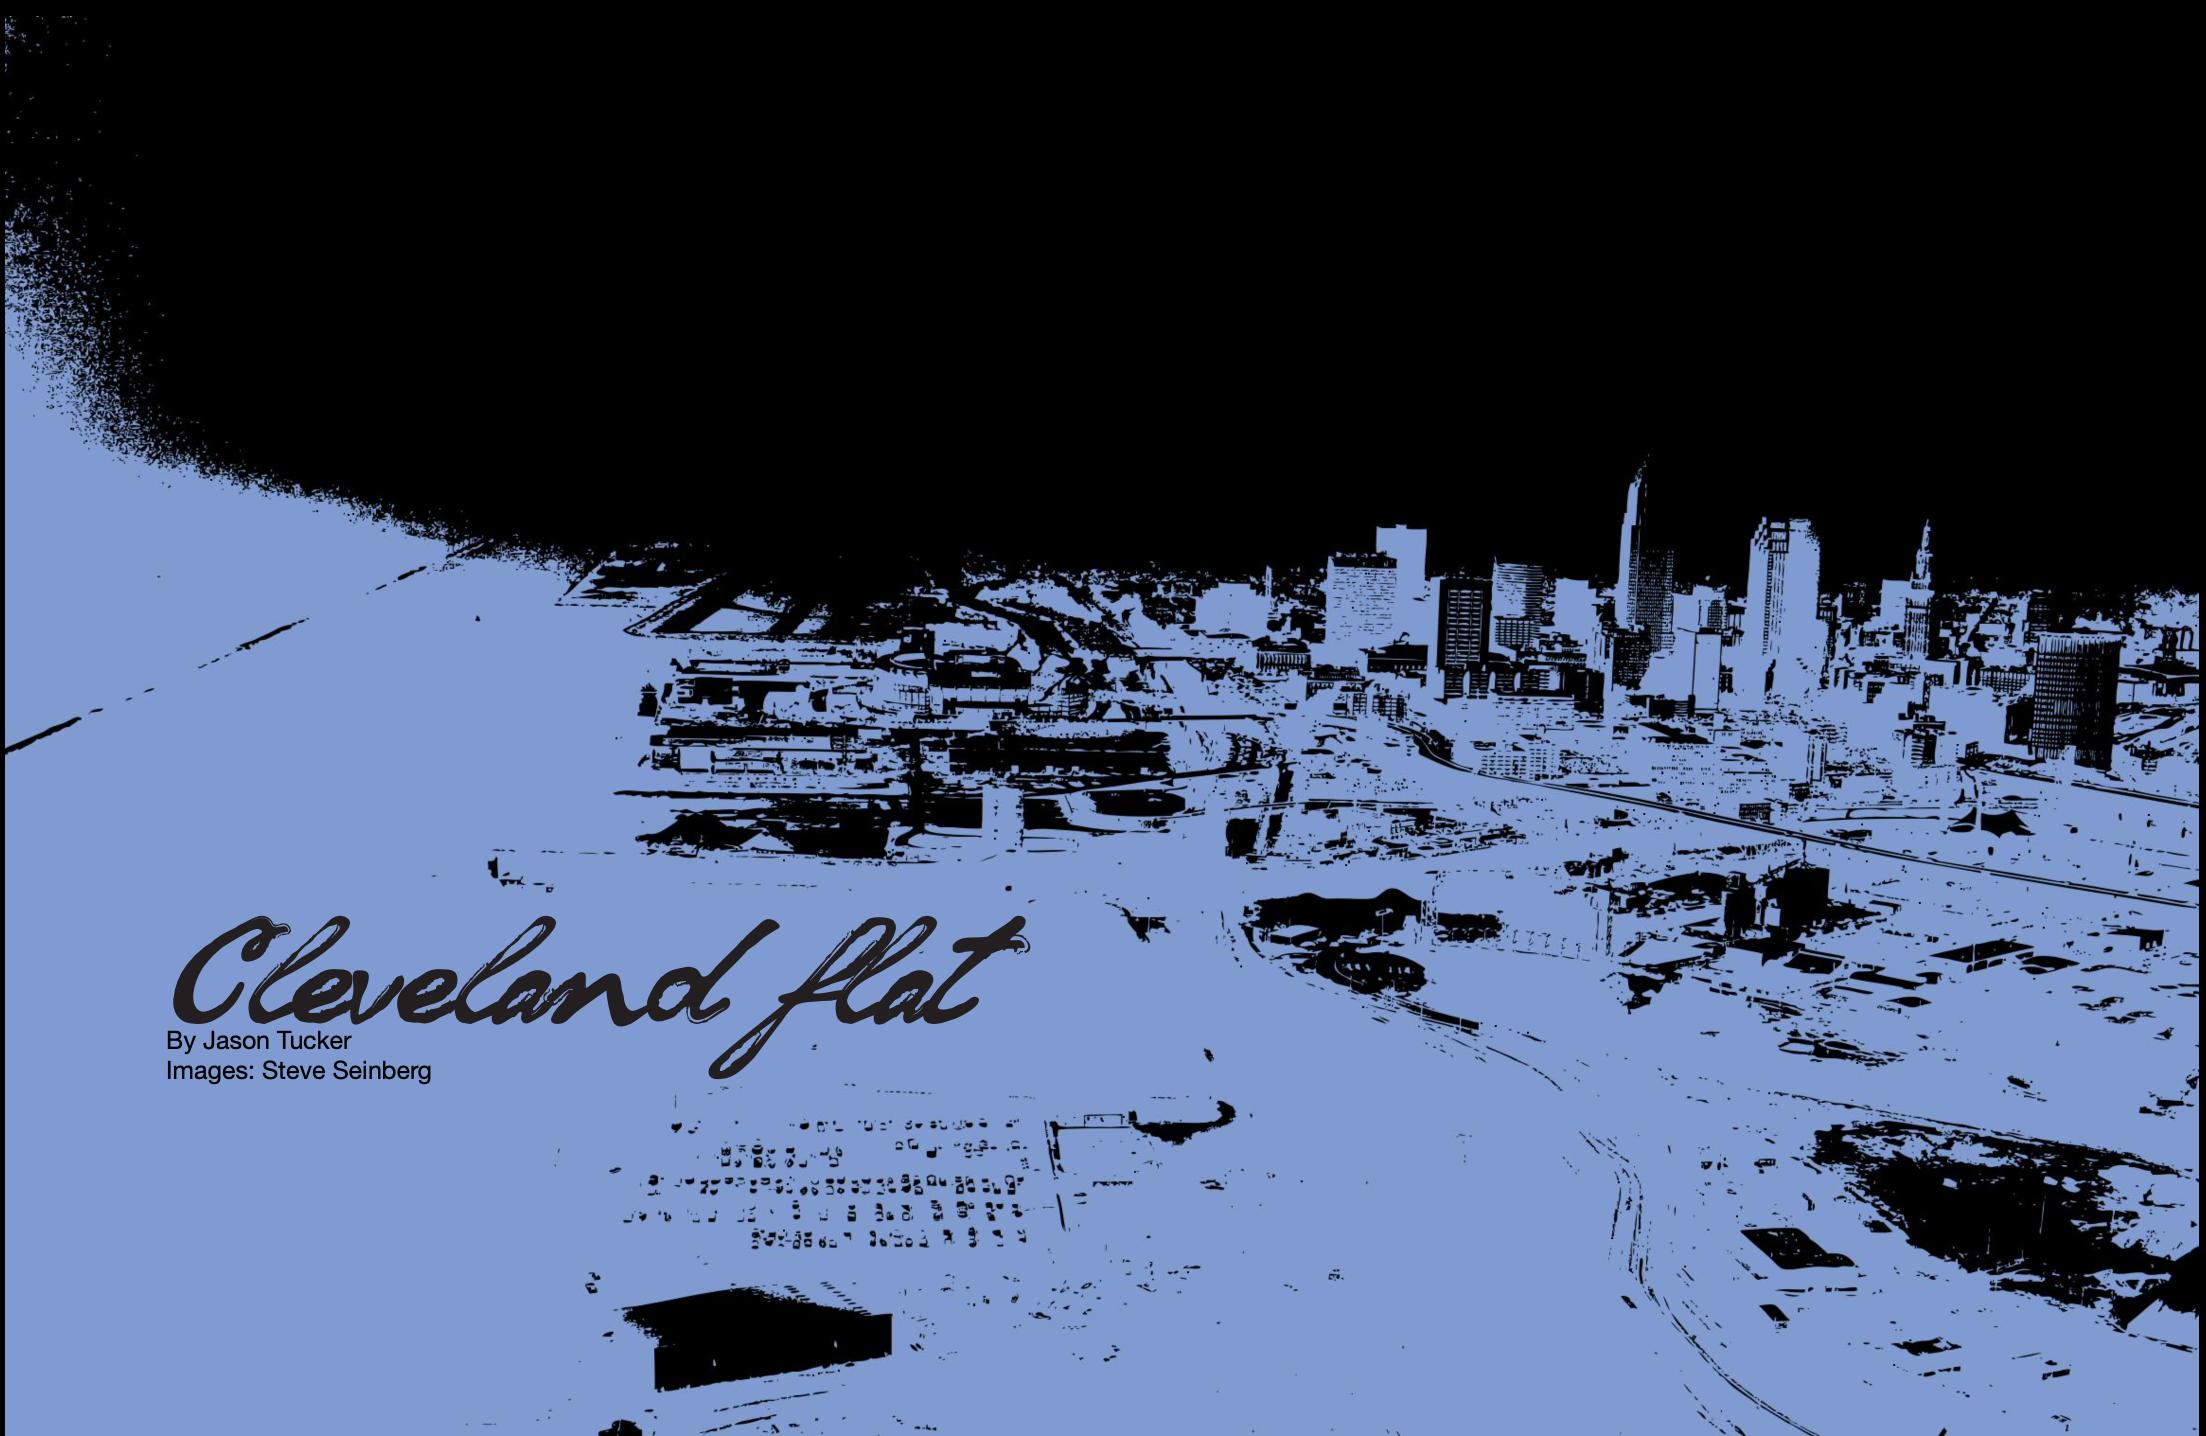 CLeveland flat